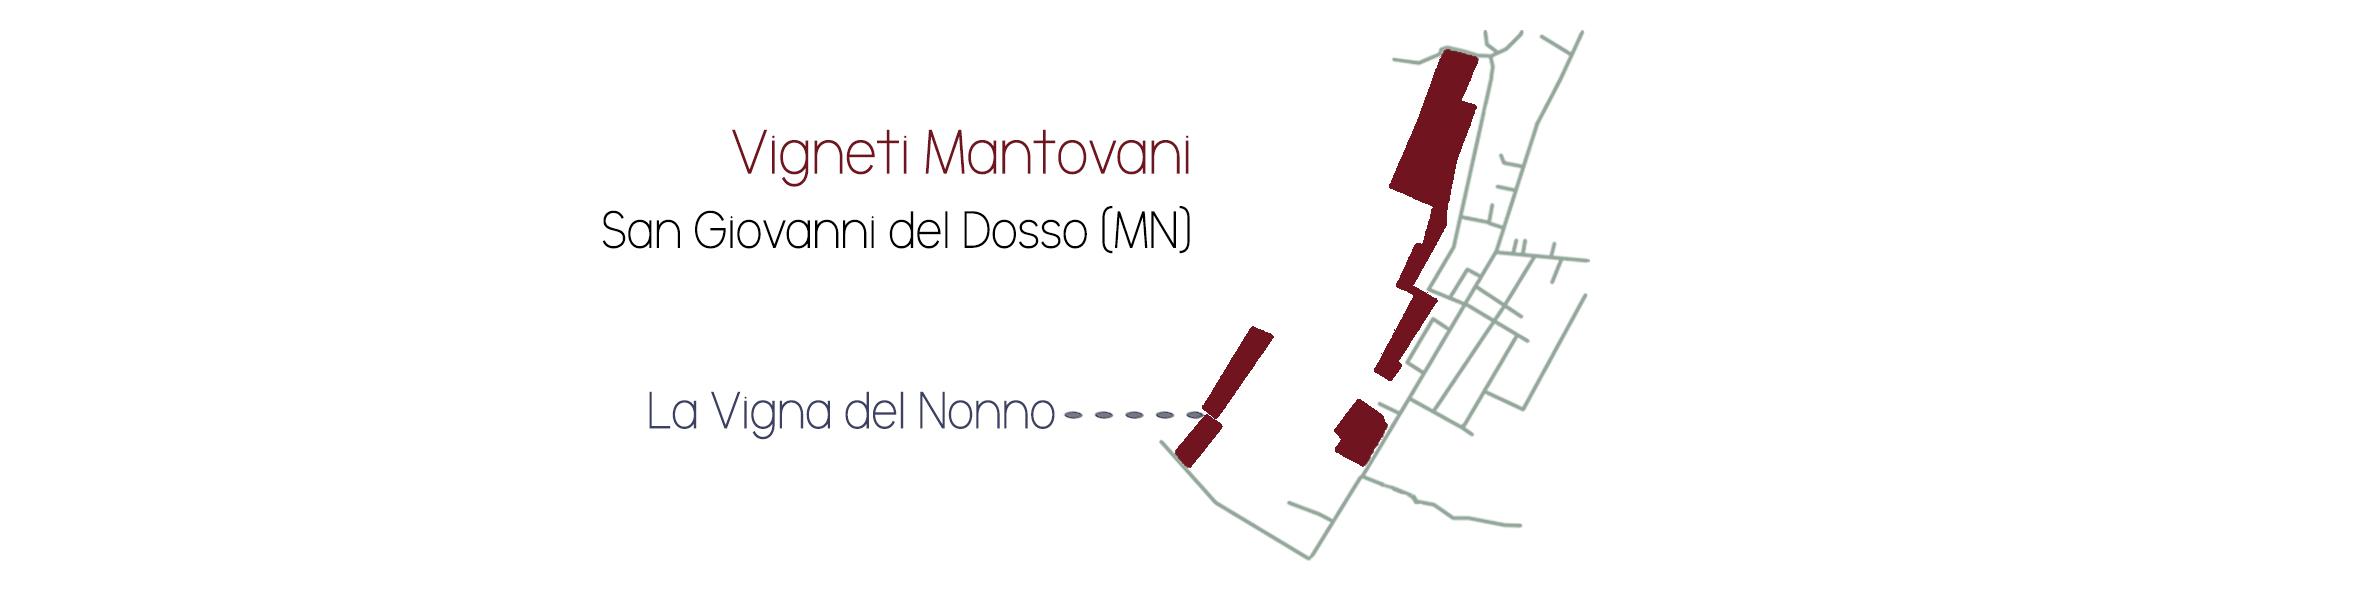 Vigneti Mantovanijpg